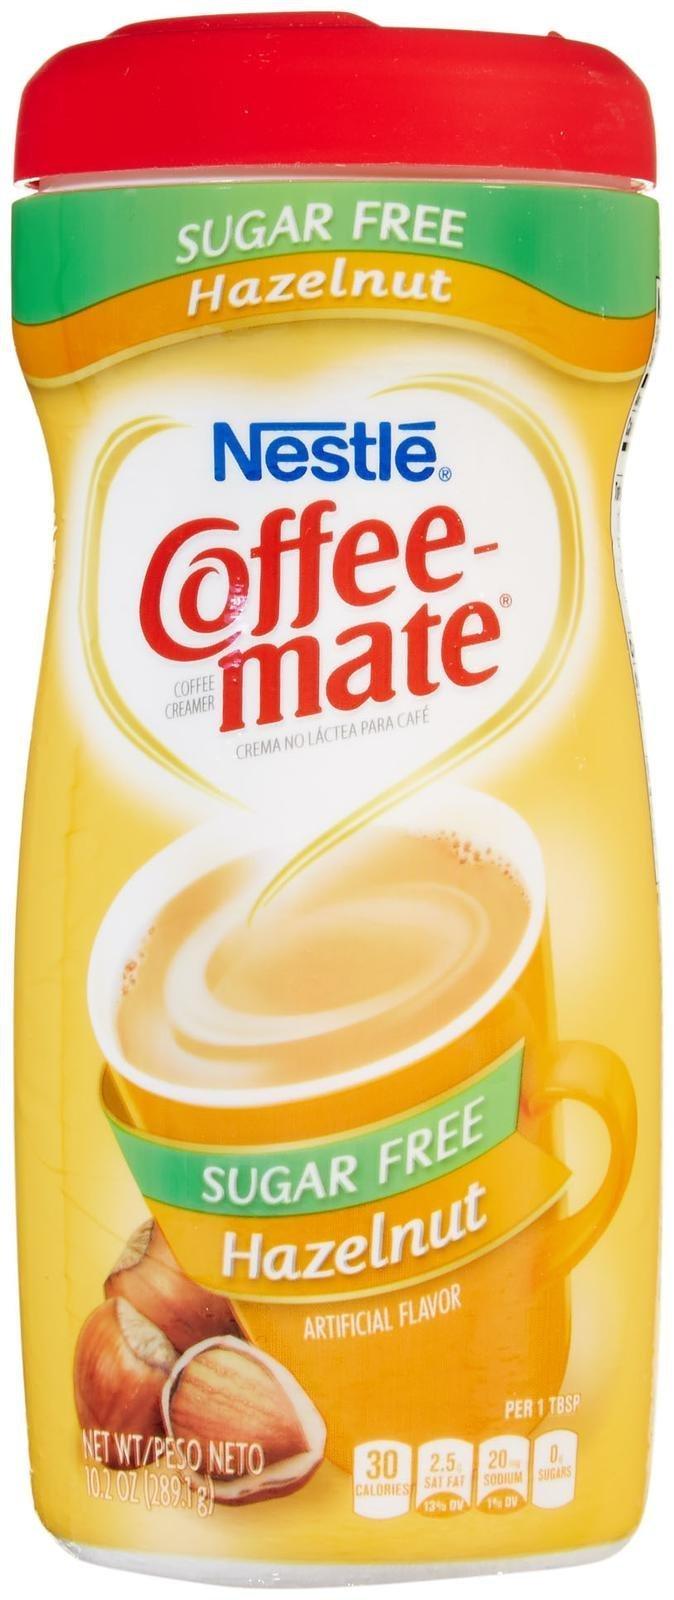 Coffee-mate Sugar-Free Powdered Coffee Creamer - Hazelnut - 10.2 oz.